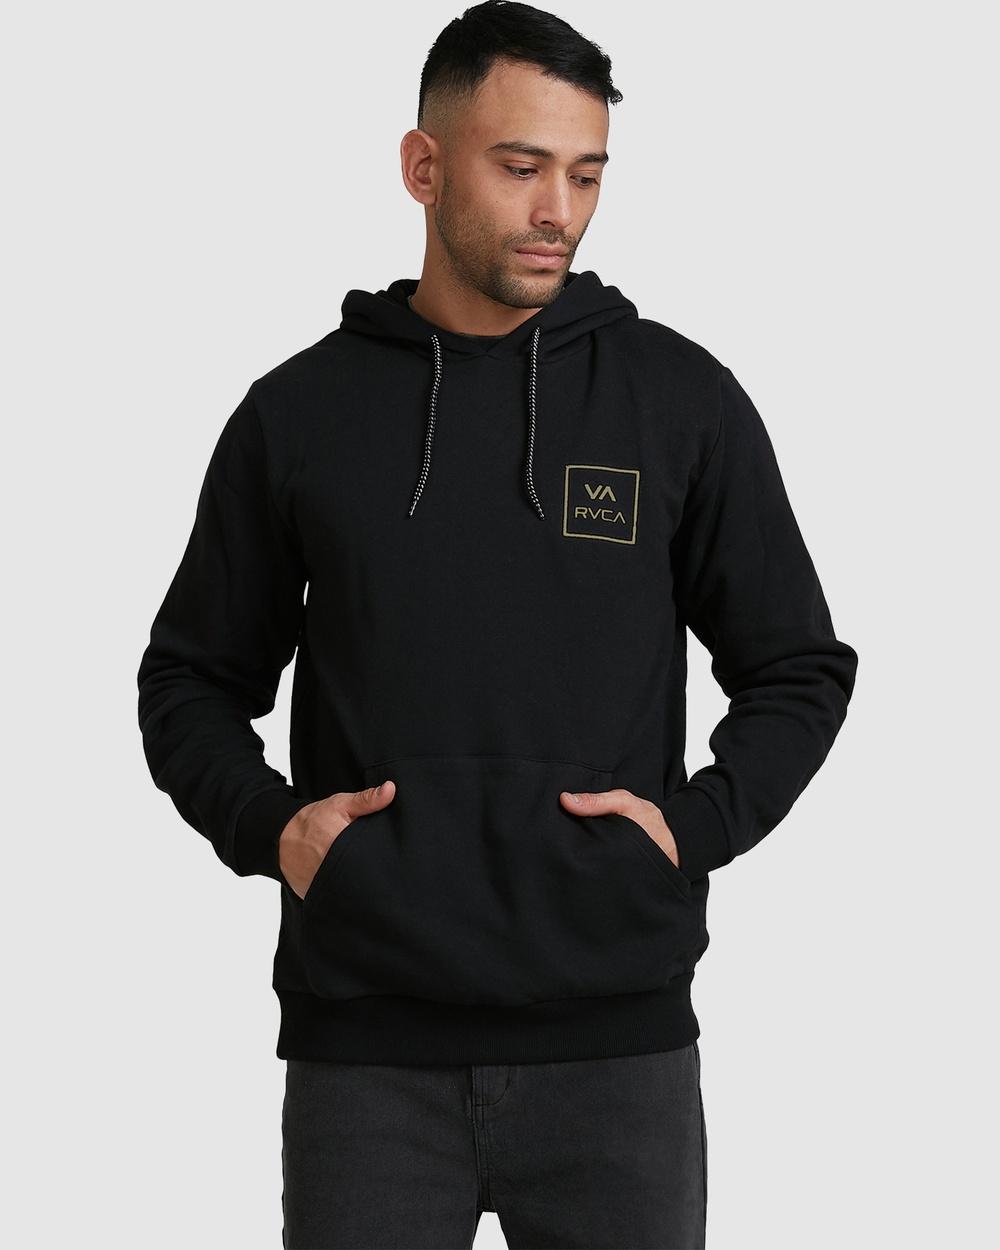 RVCA Rvca All The Ways Pullover Jumpers & Cardigans BLACK Australia